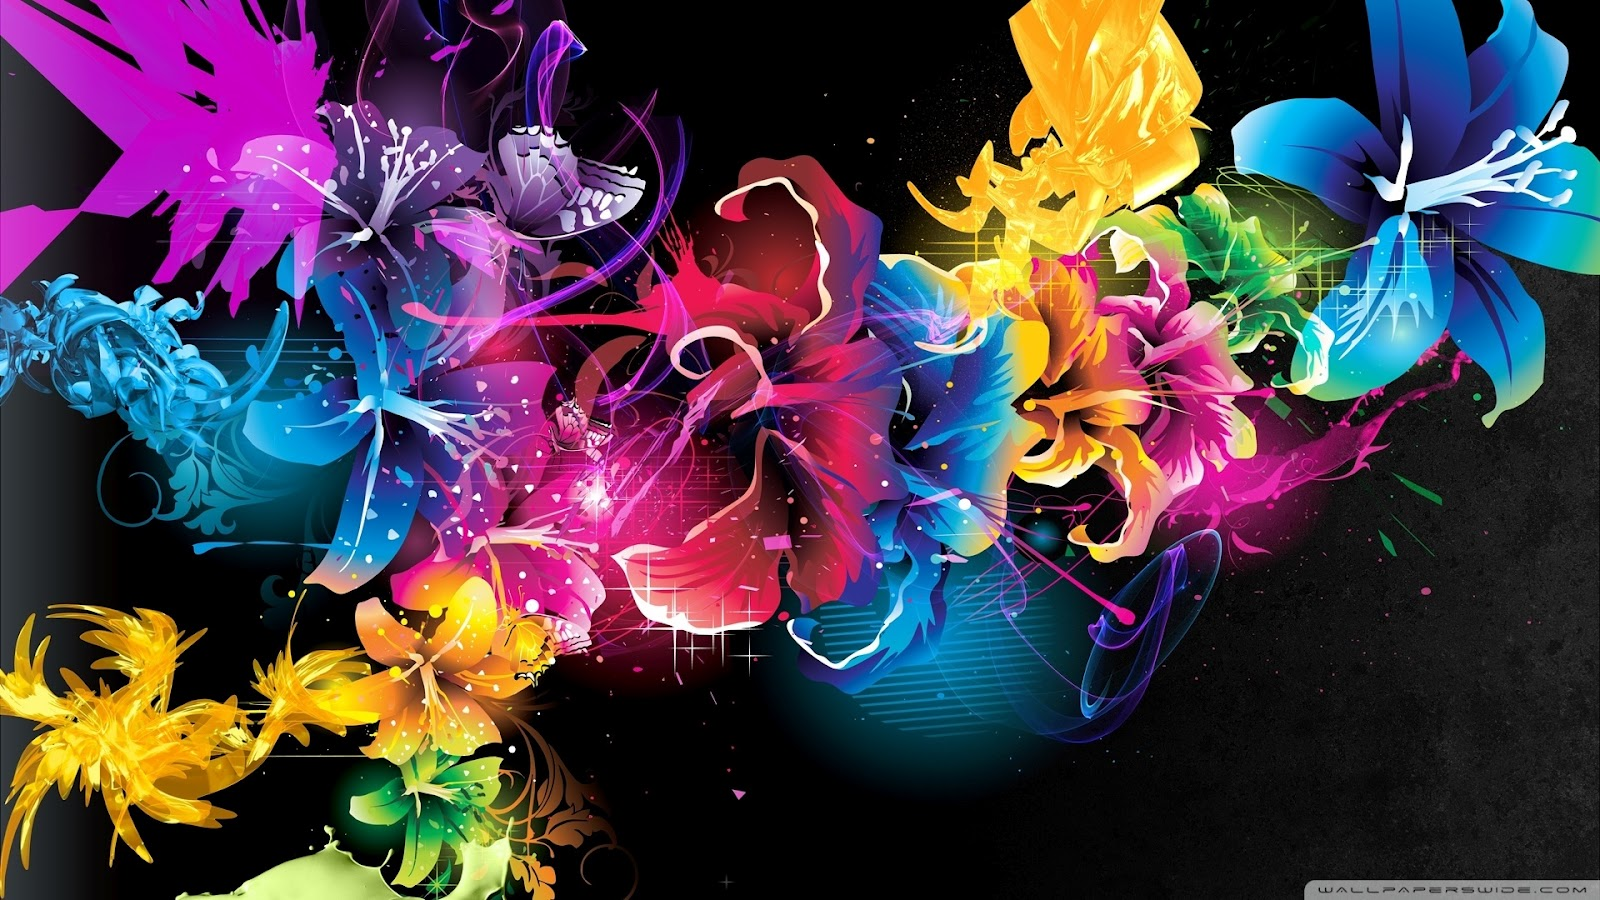 http://2.bp.blogspot.com/-YL3bHYIlo74/UAmSsqU7P-I/AAAAAAAAAW8/m9etfH1_FRc/s1600/colorful_flowers_8-wallpaper-1920x1080.jpg